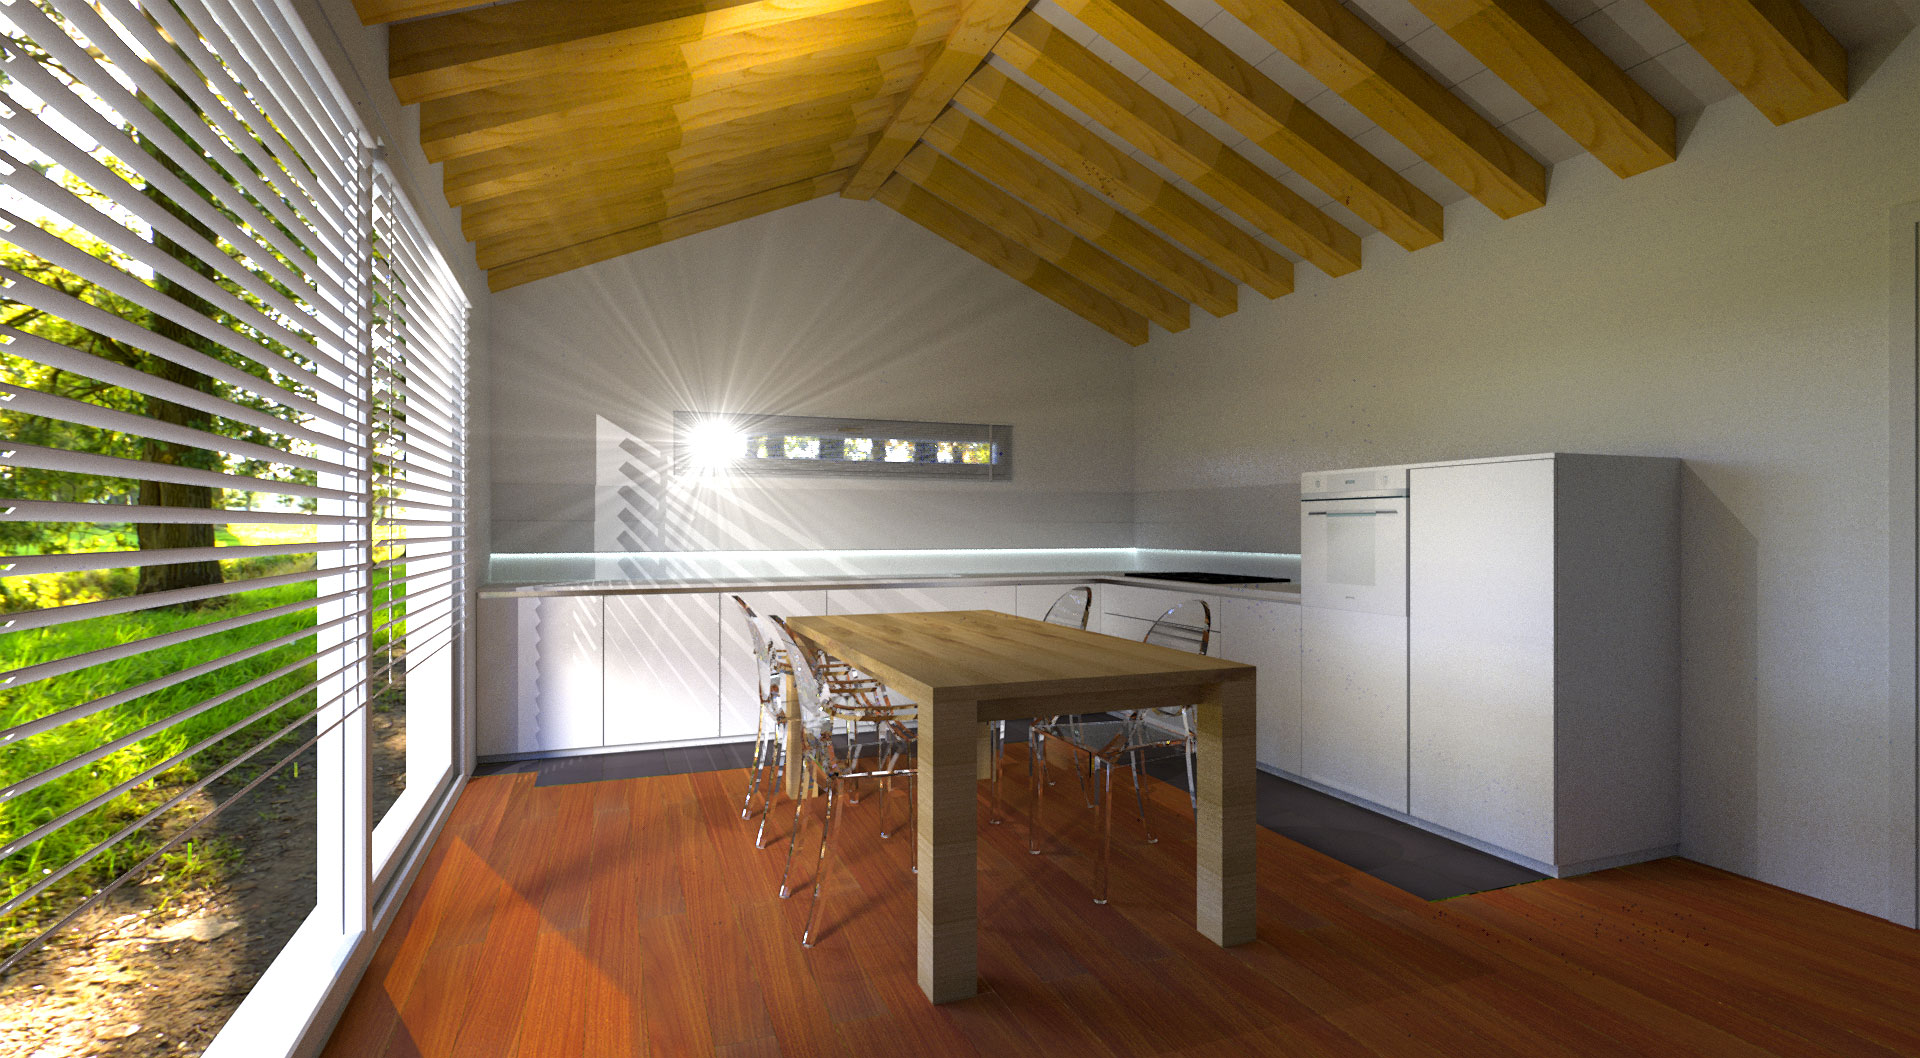 blocco cucina classica